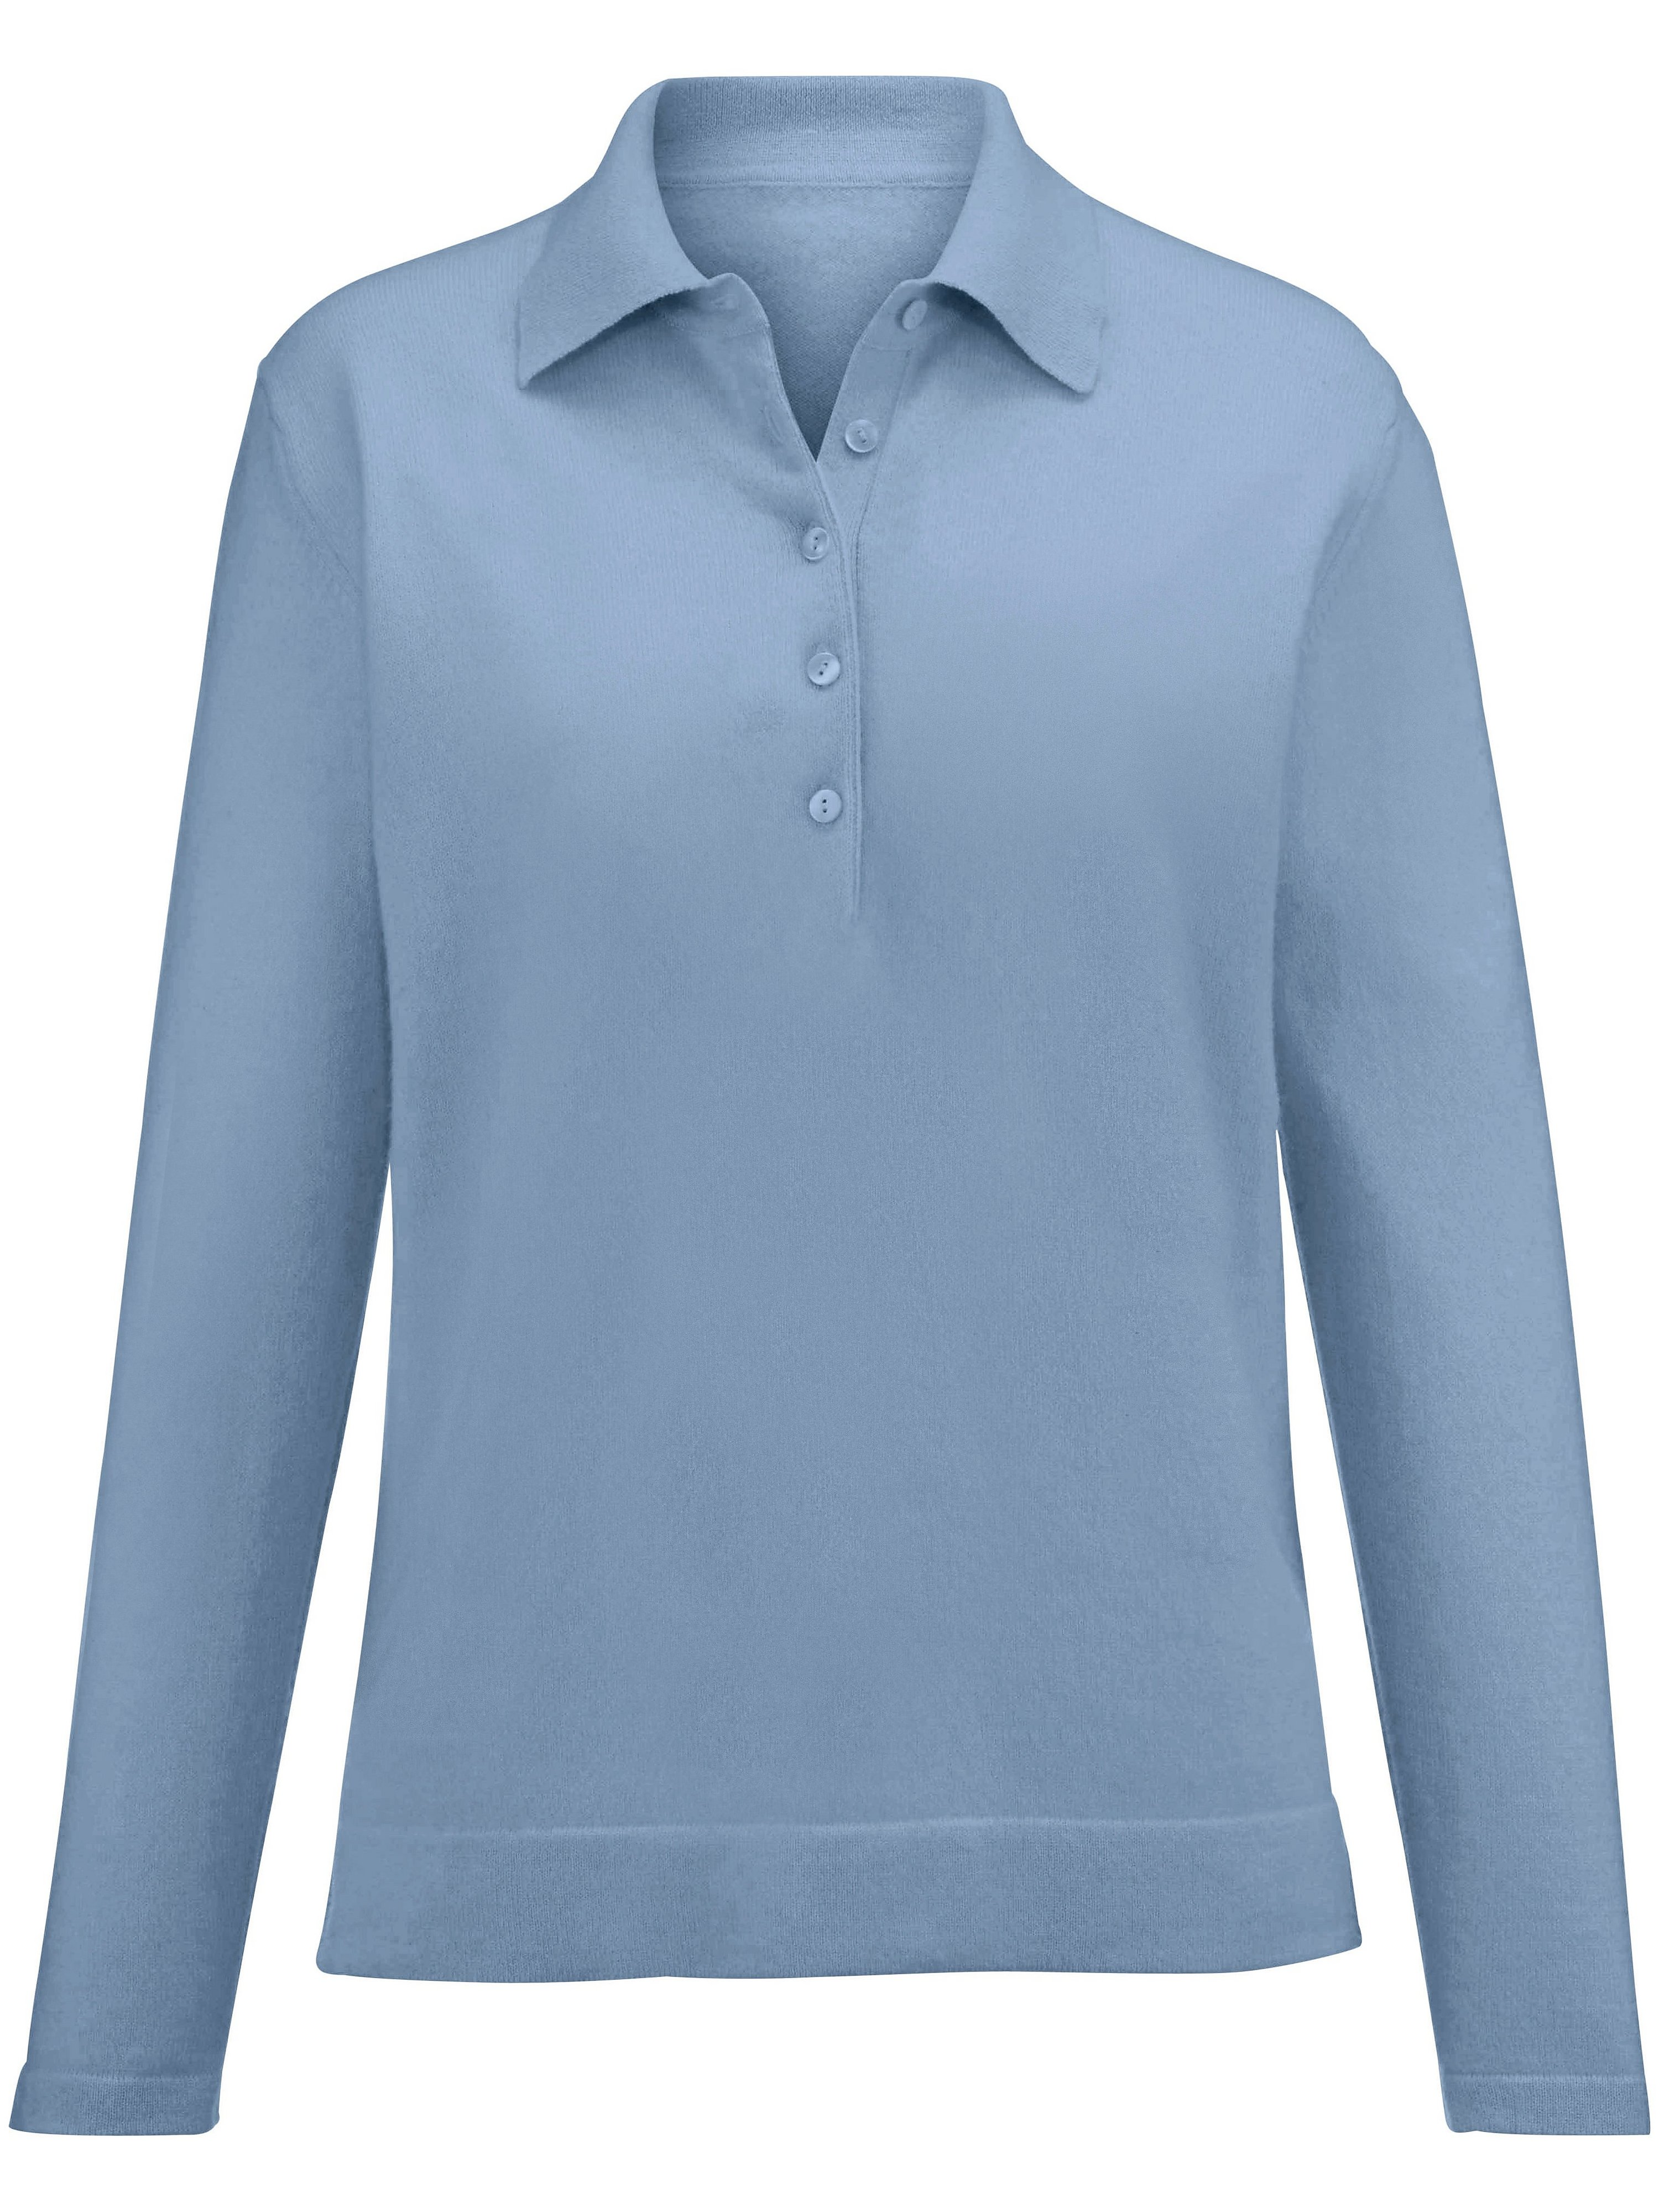 Polo collar jumper design Paula Peter Hahn Cashmere blue